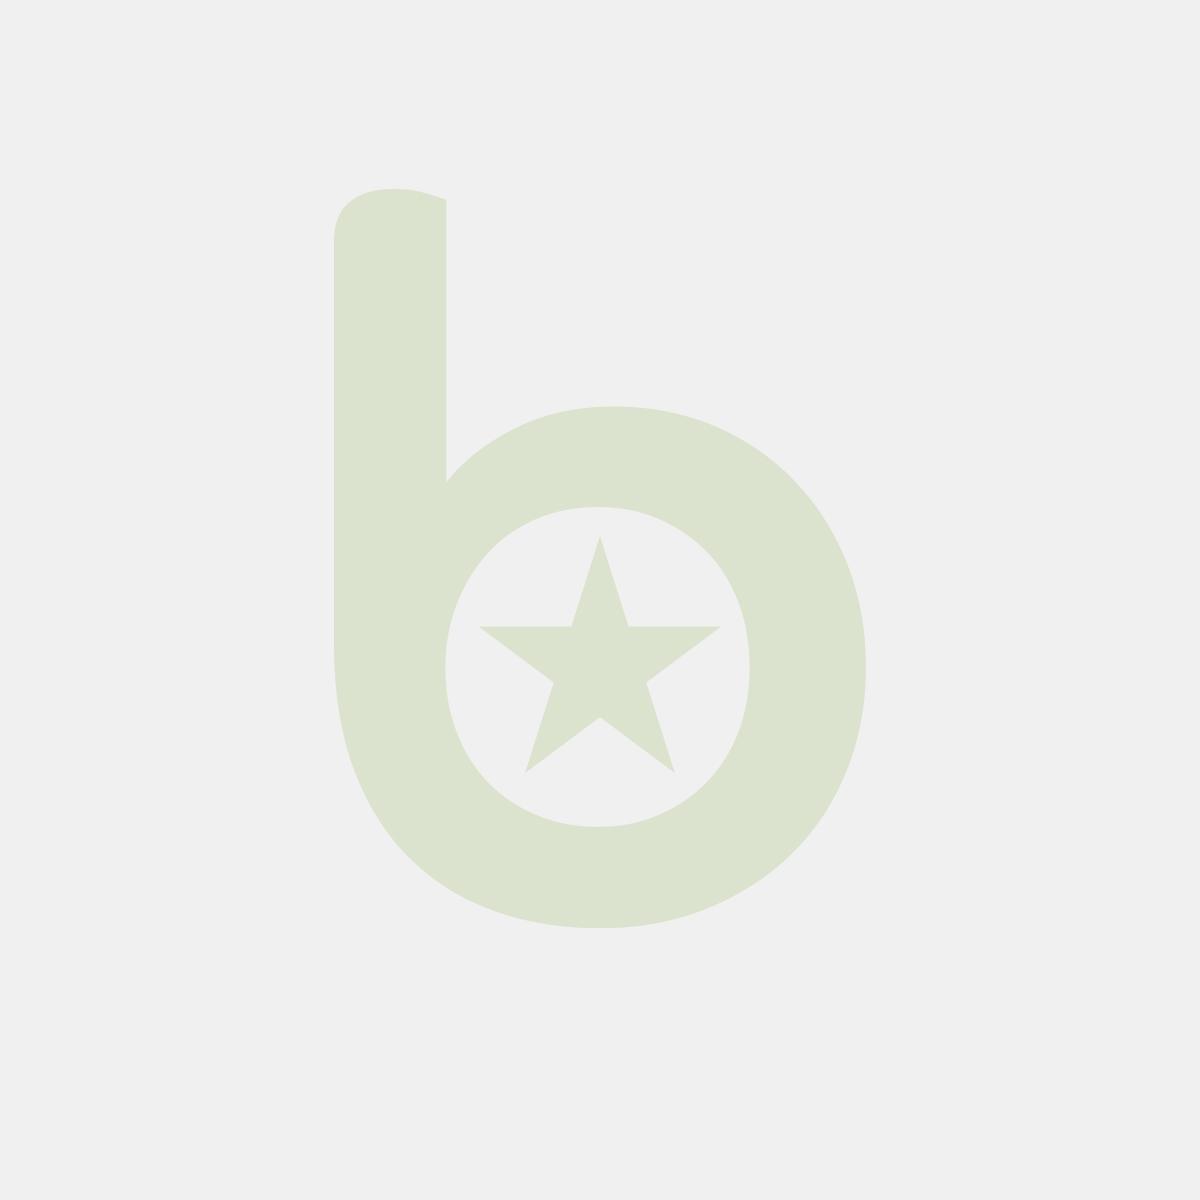 Taca cateringowa PET Sabert 36x24cm czarna op. 10 sztuk